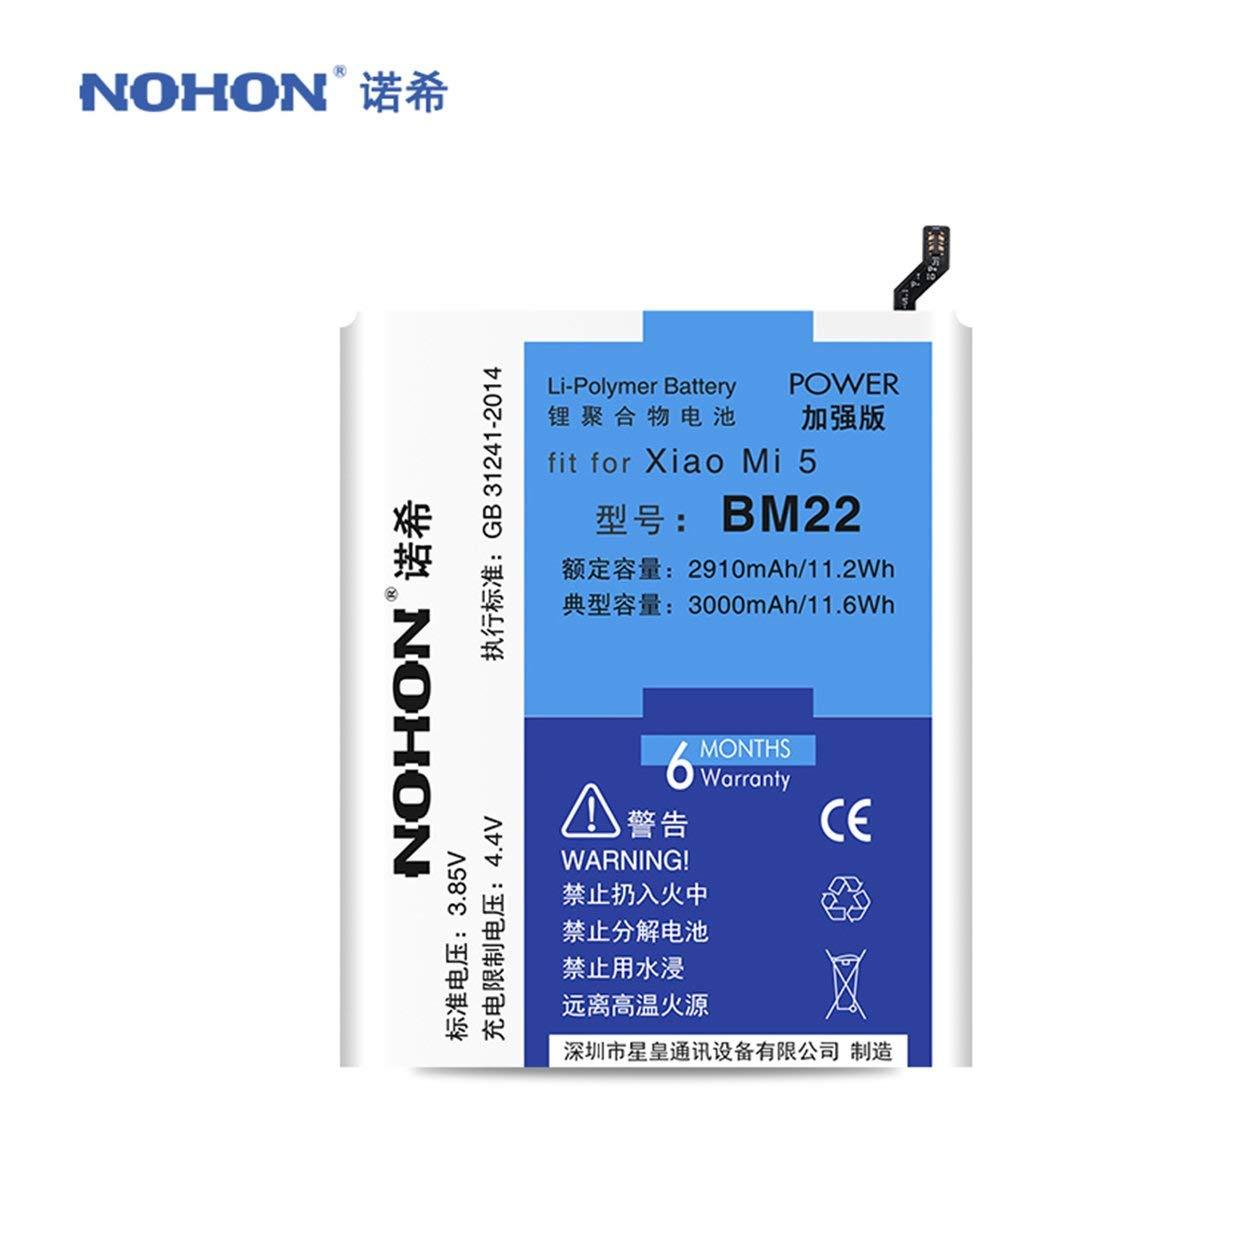 Lorenlli Bater/ías de tel/éfono de bater/ía de reemplazo de la bater/ía del tel/éfono m/óvil de Gran Capacidad 3000mAh adecuadas para Xiaomi Mi5 BM22